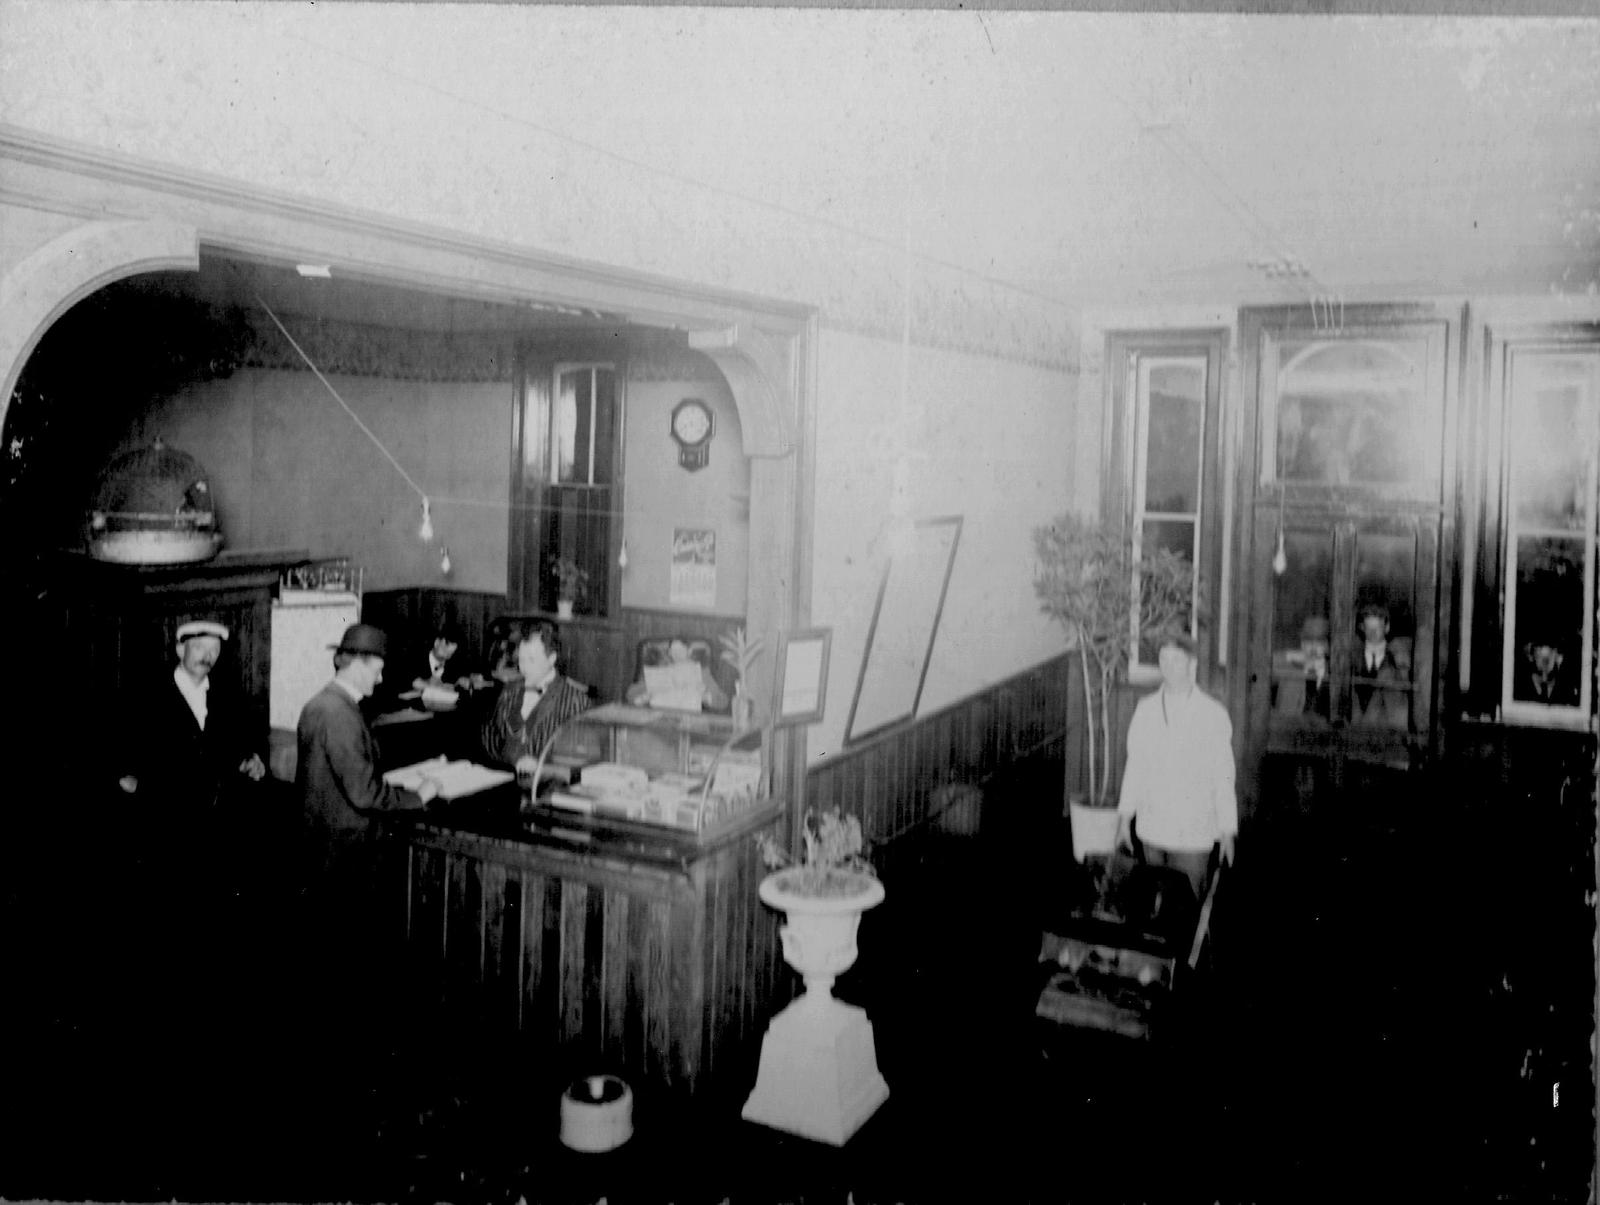 Photograph of the interior of Brunswick Hotel, Colborne, Cramahe Township